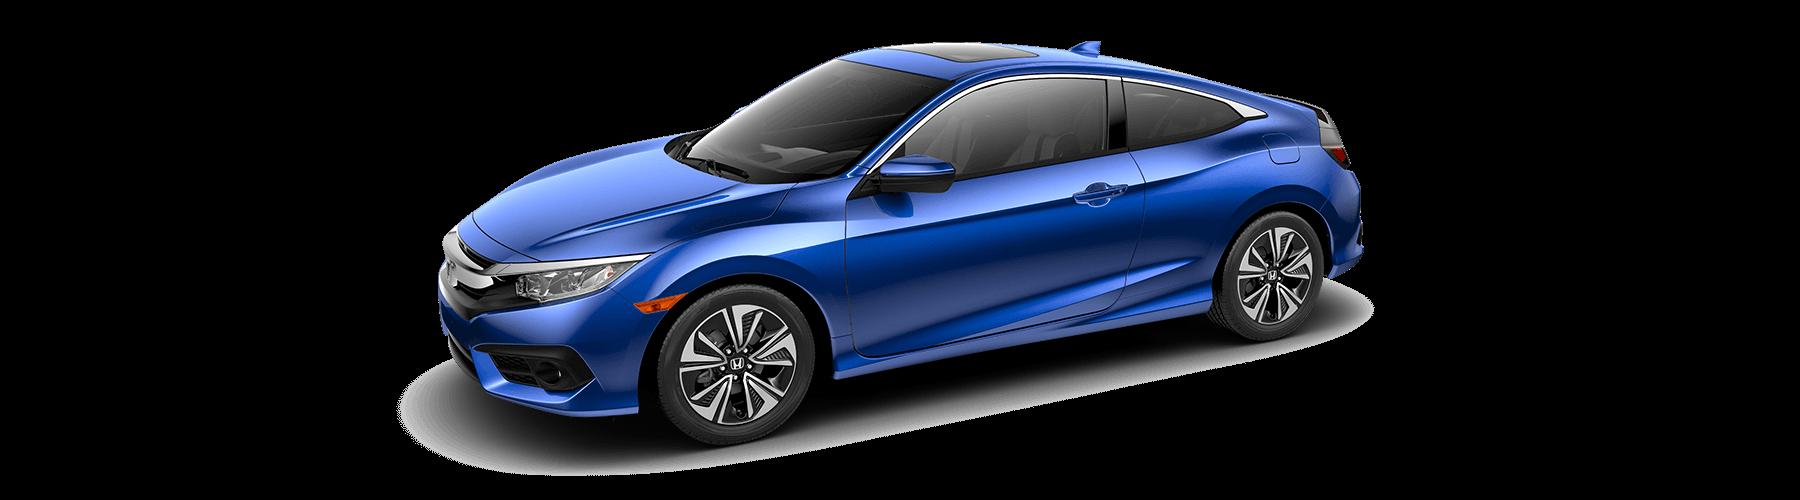 2017 Honda Civic Coupe Front Angle